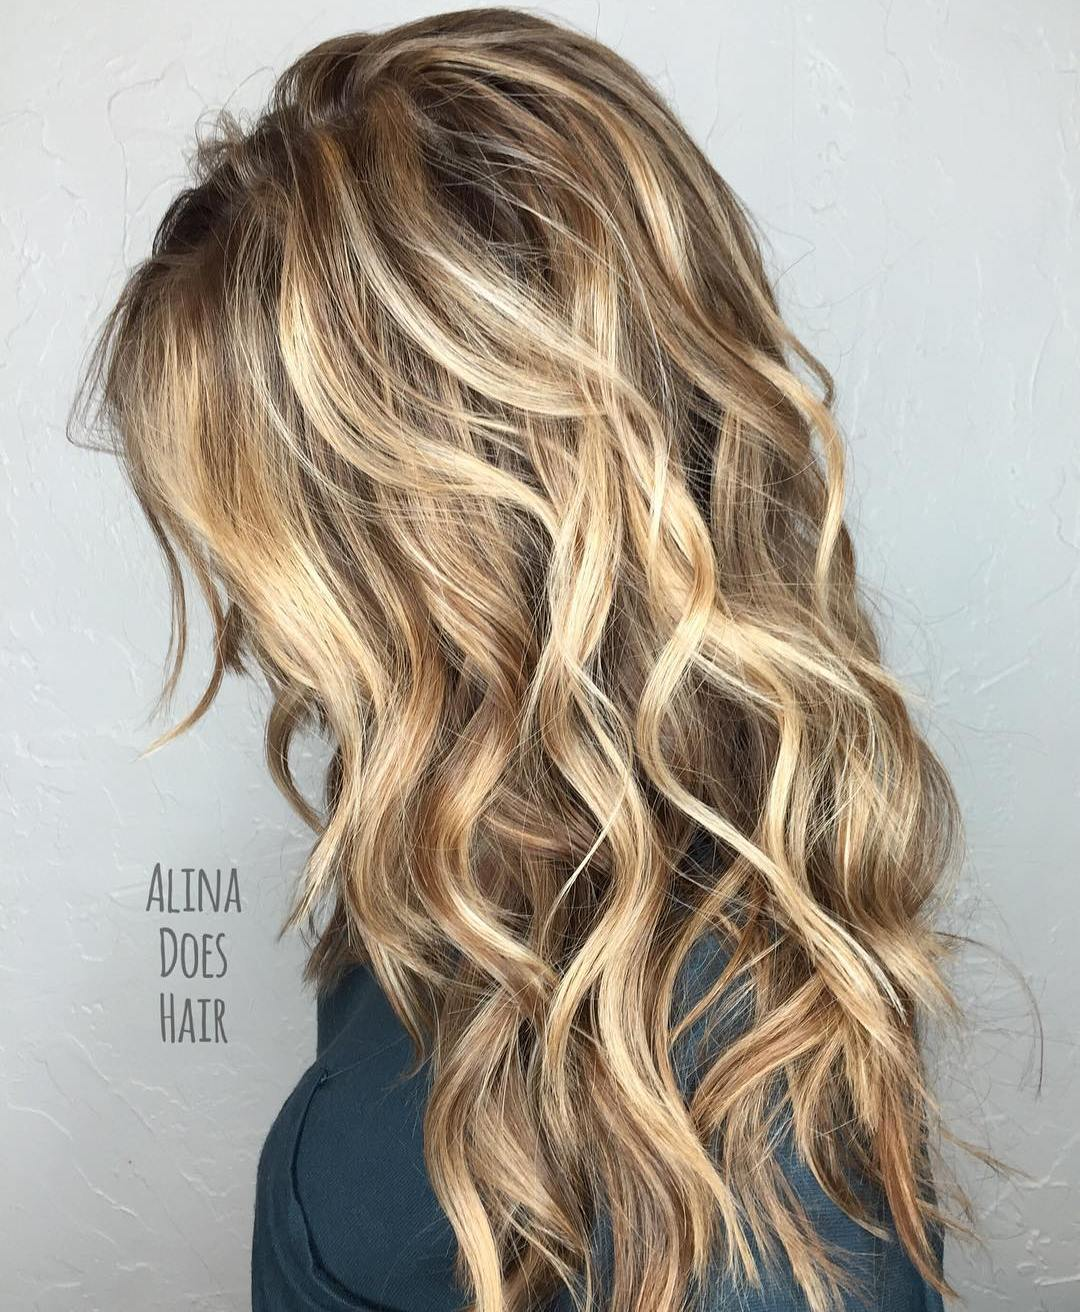 1-long-layered-sandy-blonde-hair